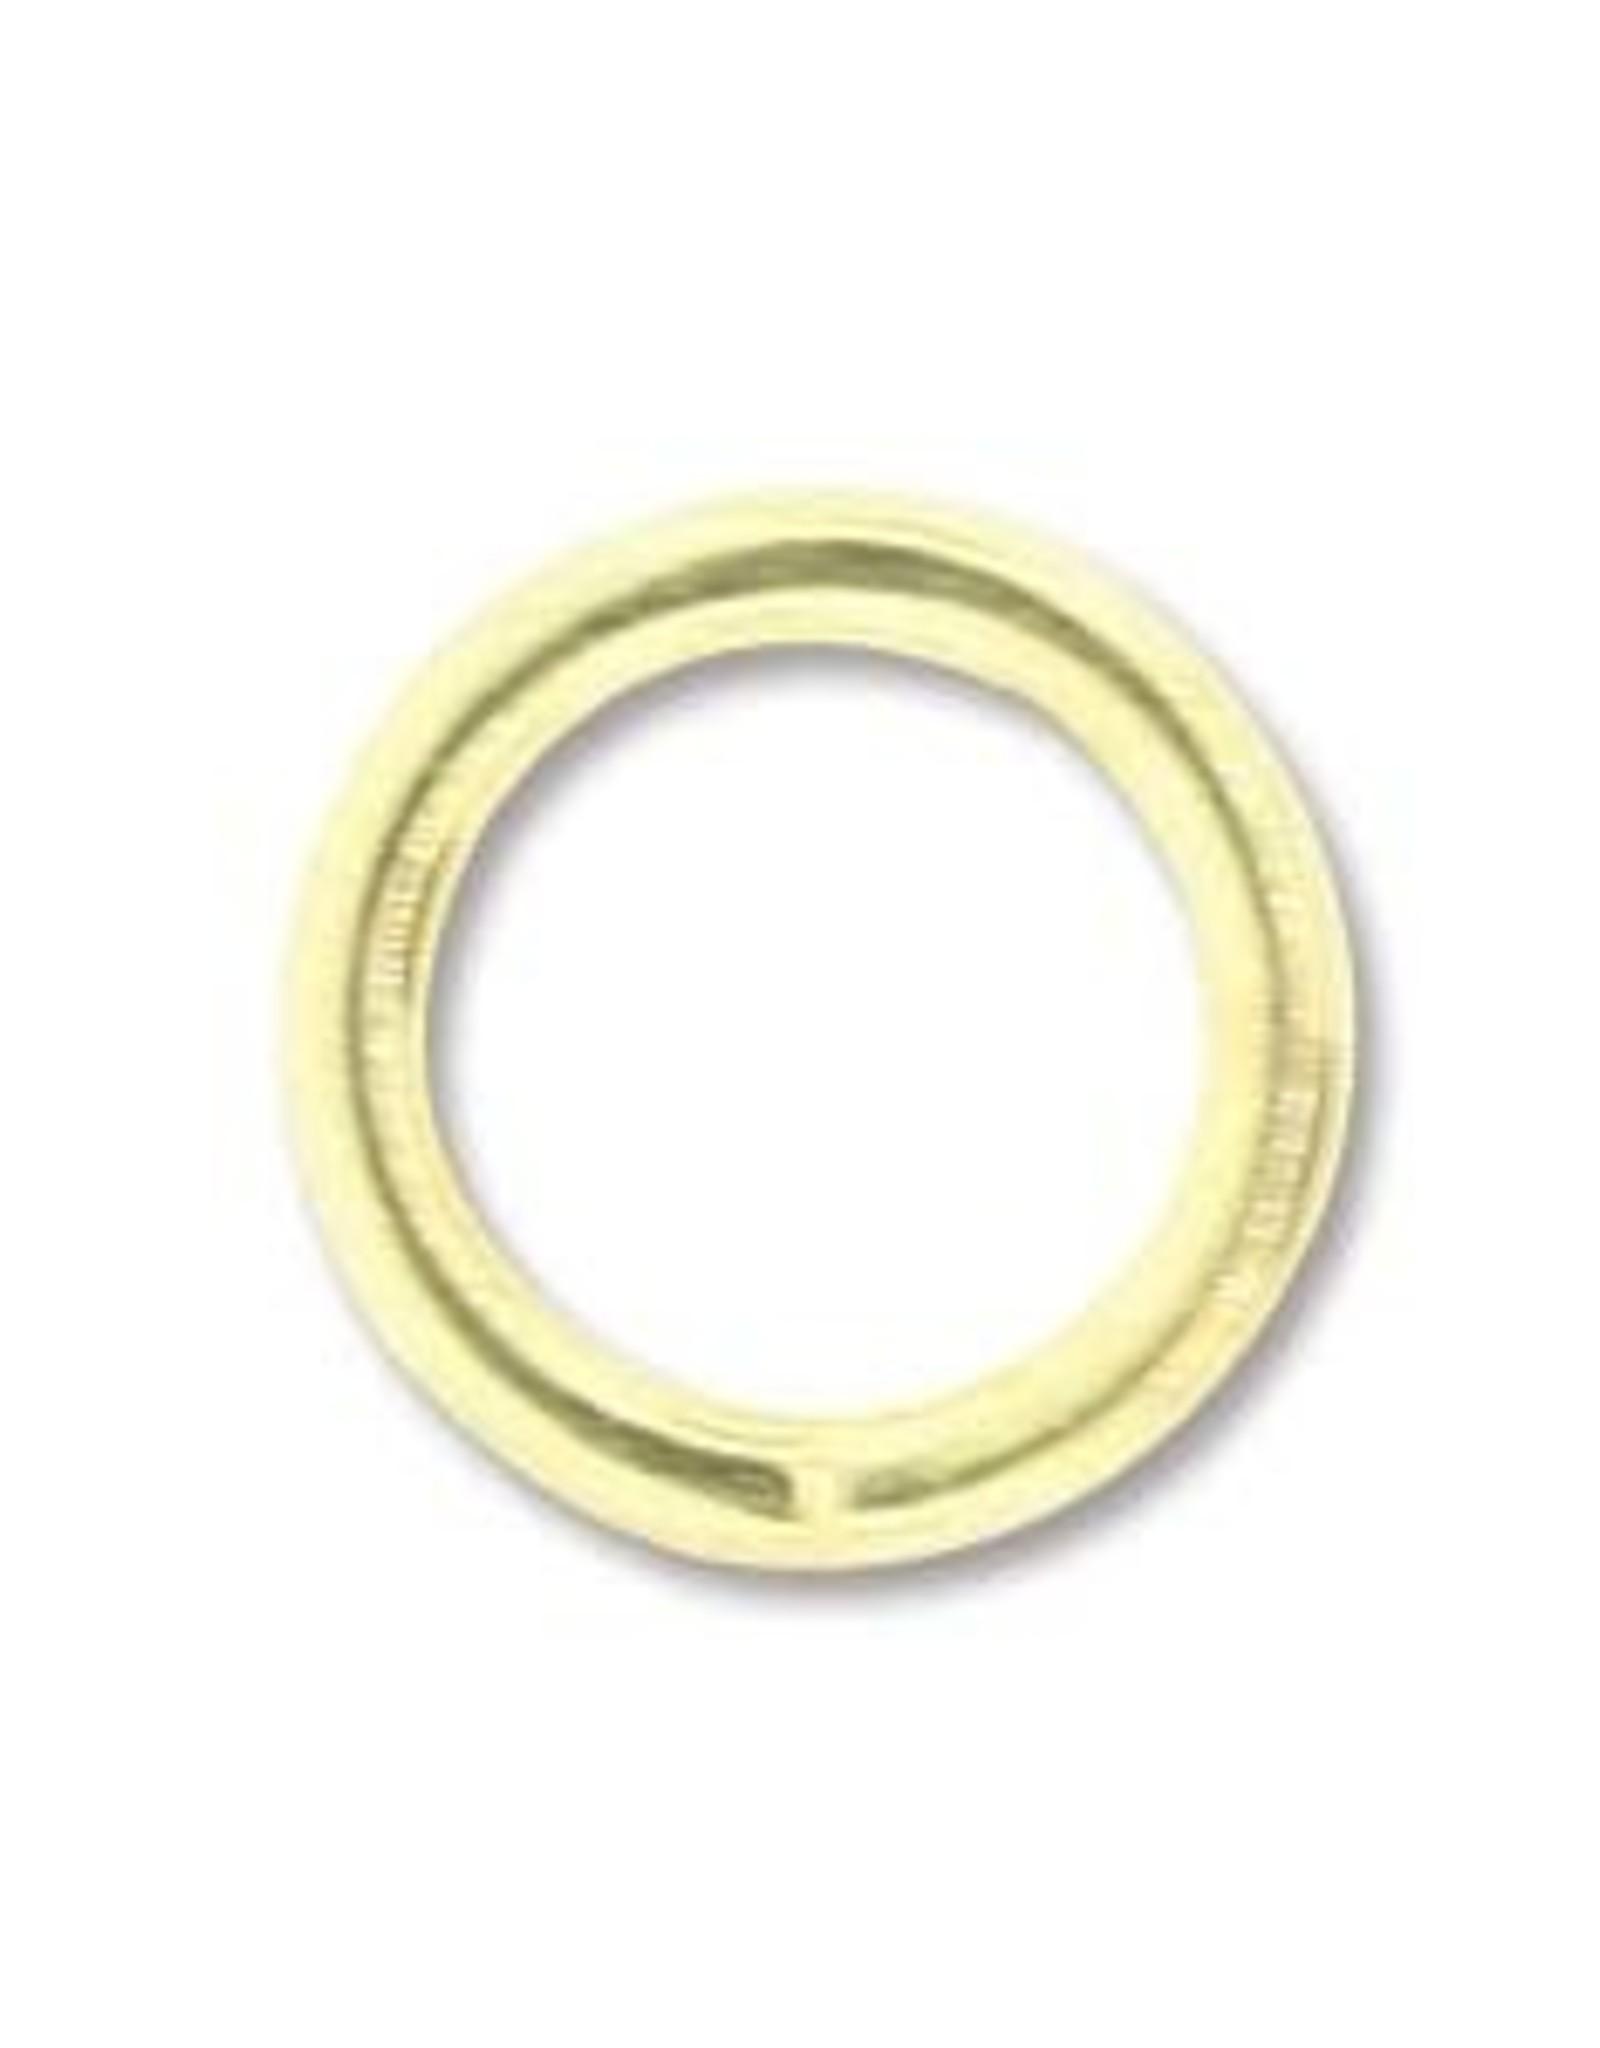 5mm Jump Ring 20ga Gold Plate Qty 24